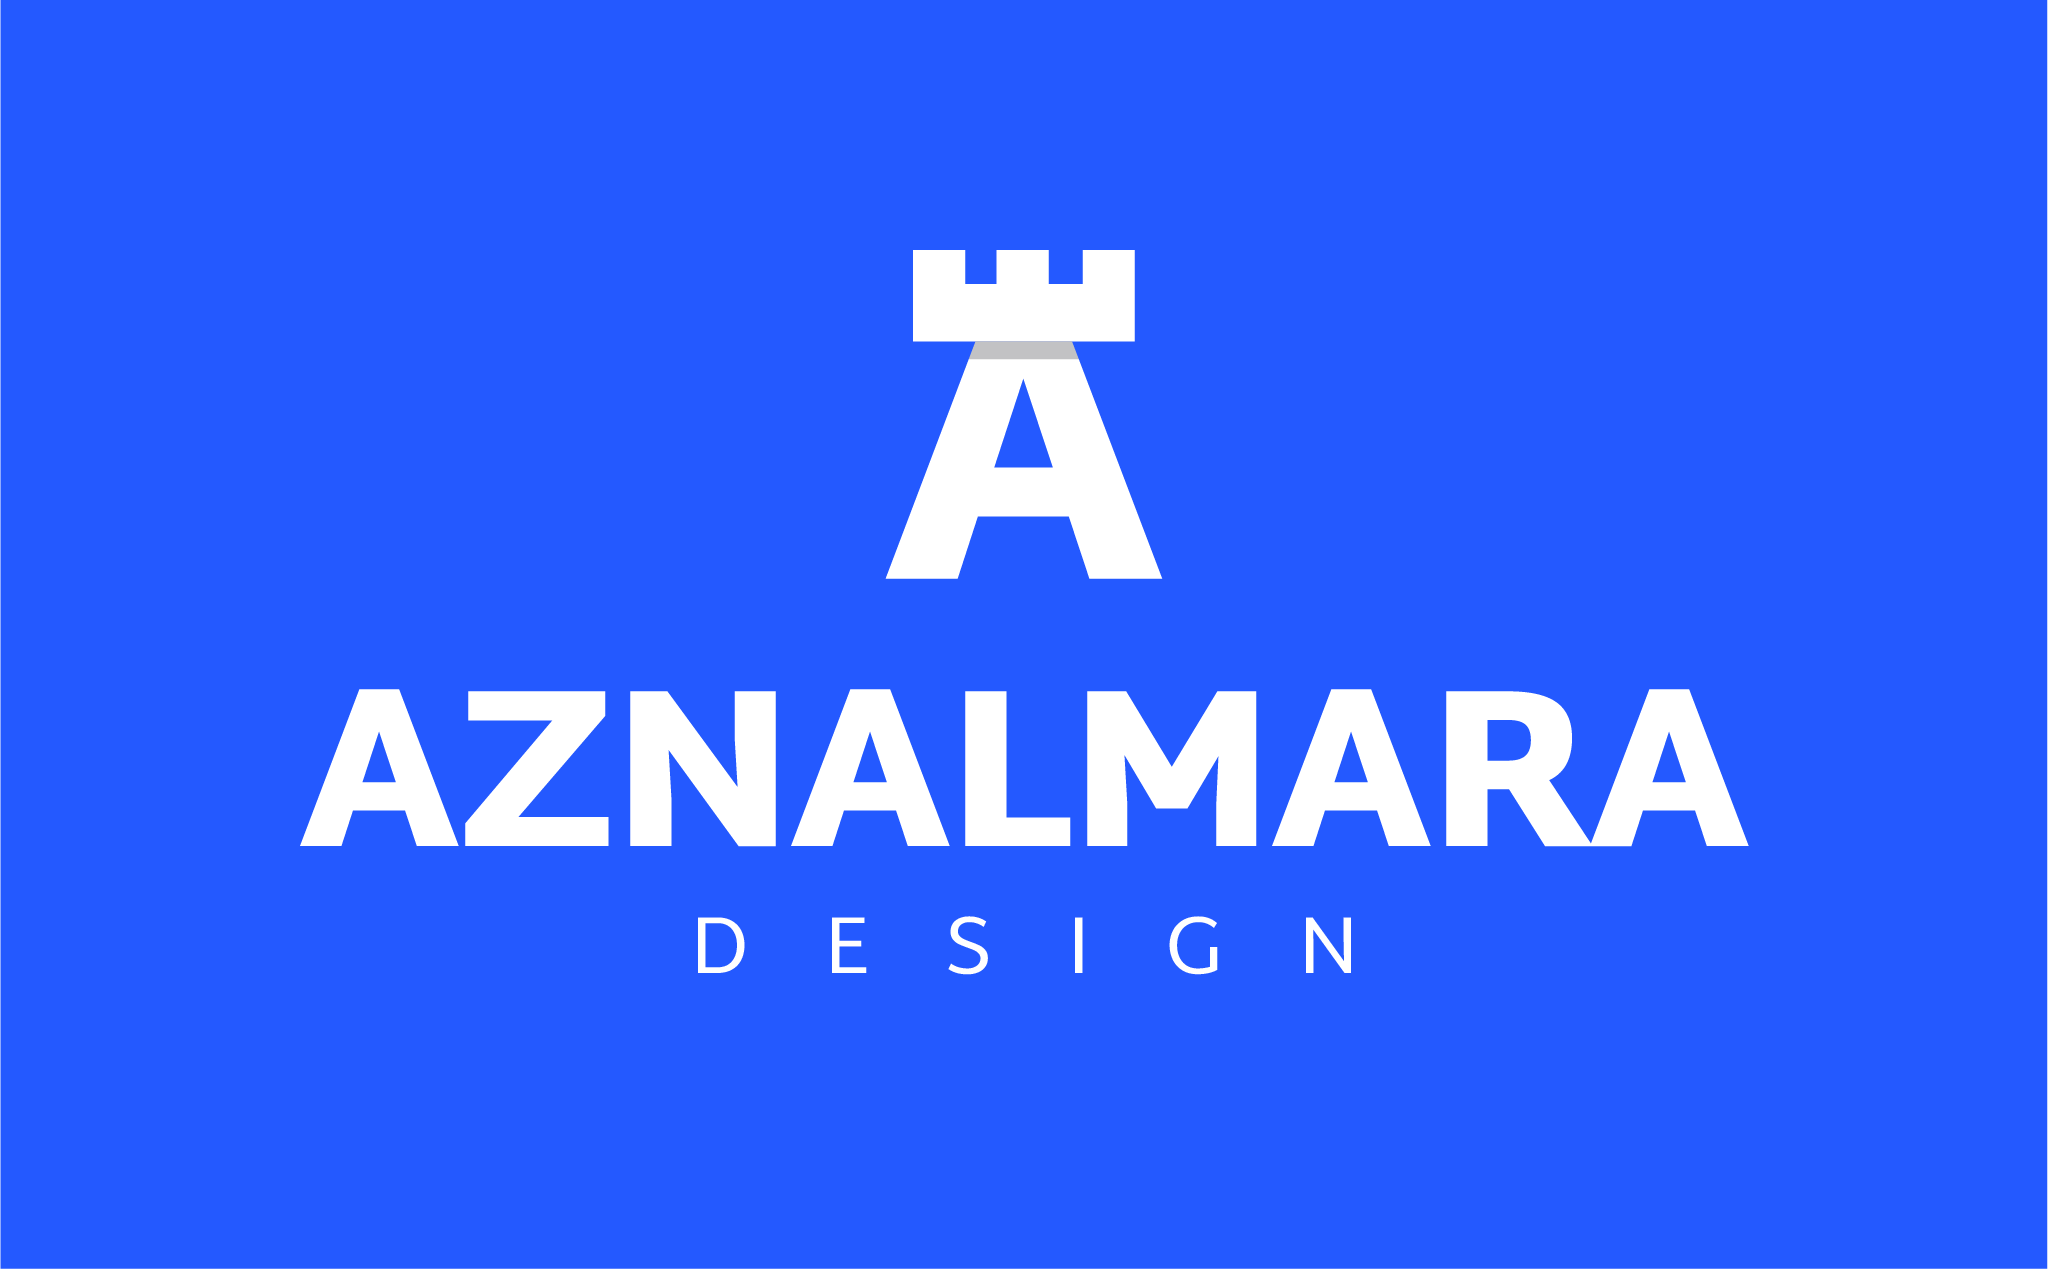 LOGO_VERTICAL_AZNALMARA®_DESIGN_BLANCO_FONDO_AZUL